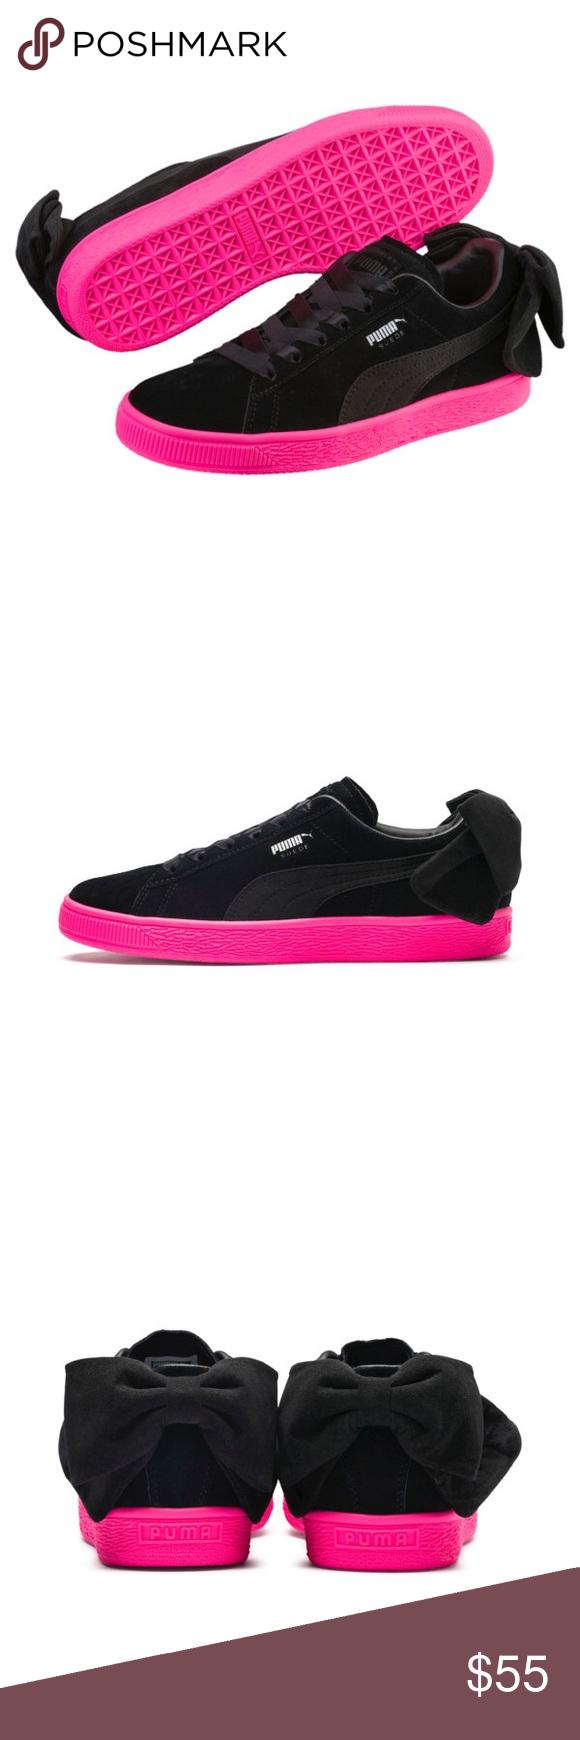 Puma Women's Suede Basket Bow Sneakers Size 6 NIB Puma